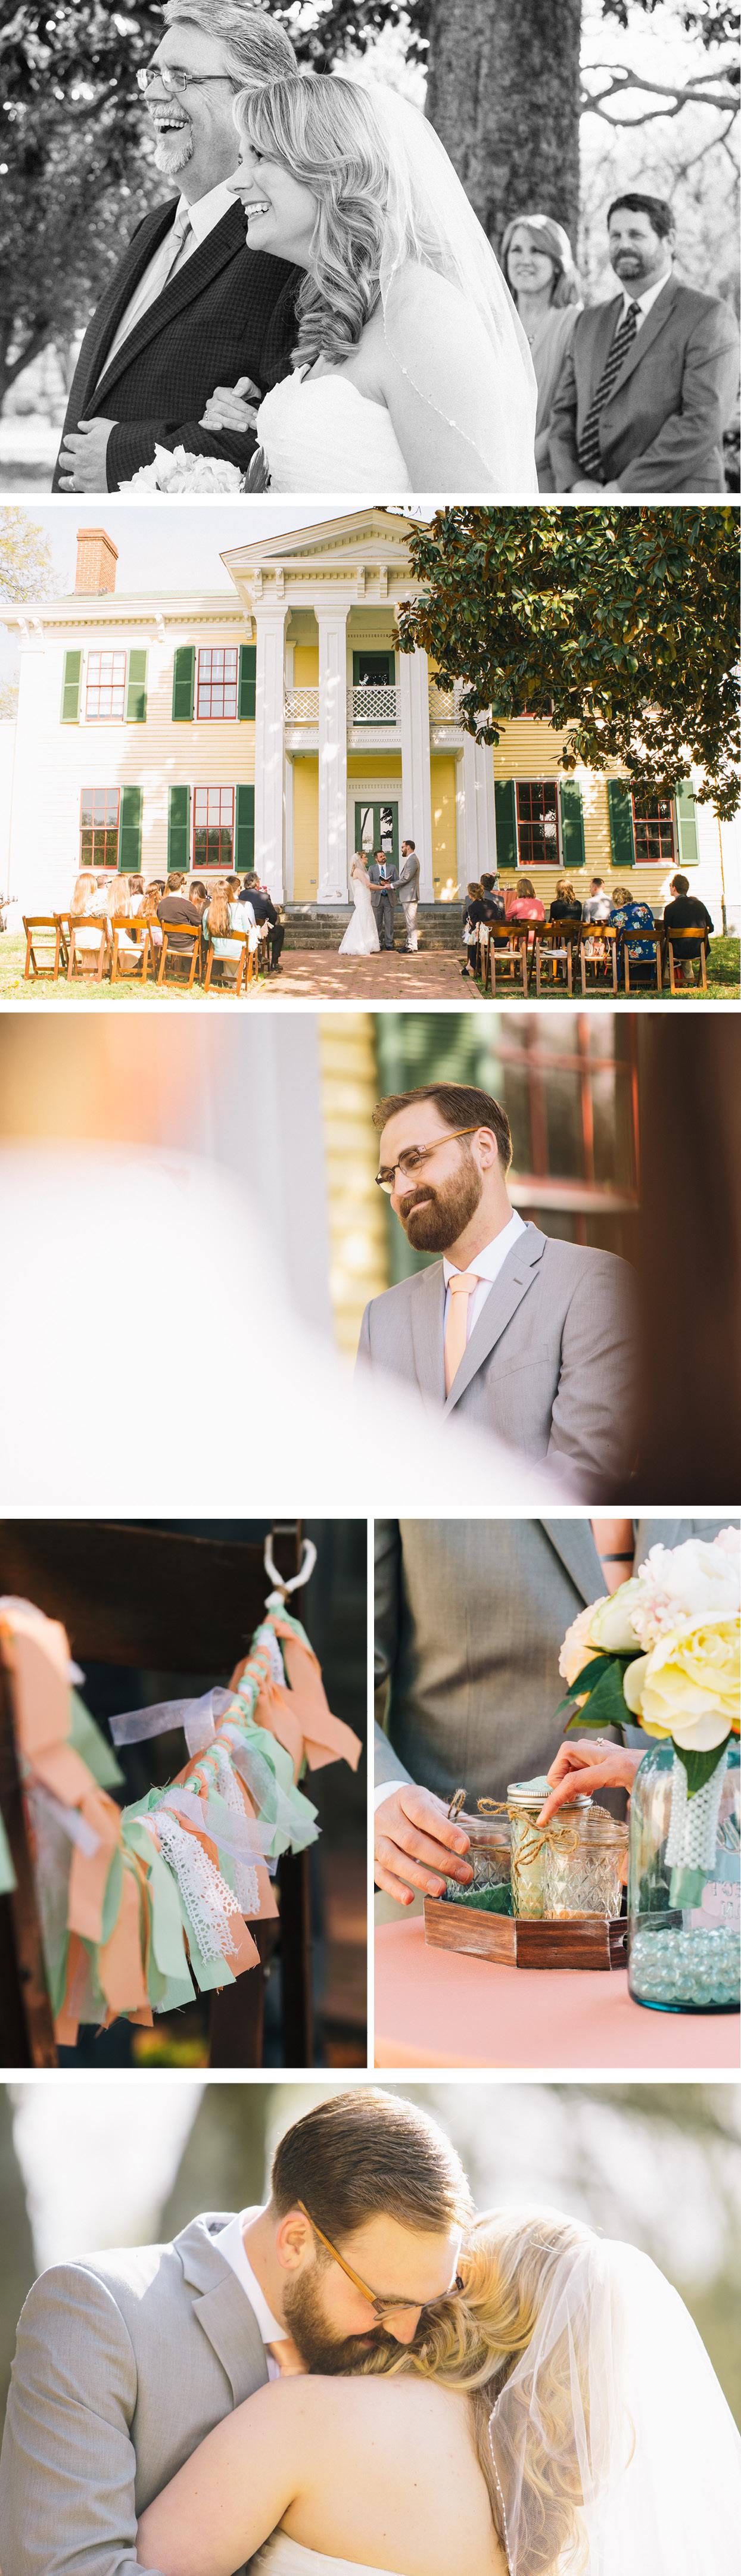 CK-Photo-Nashville-Wedding-Photographer-ST4.jpg